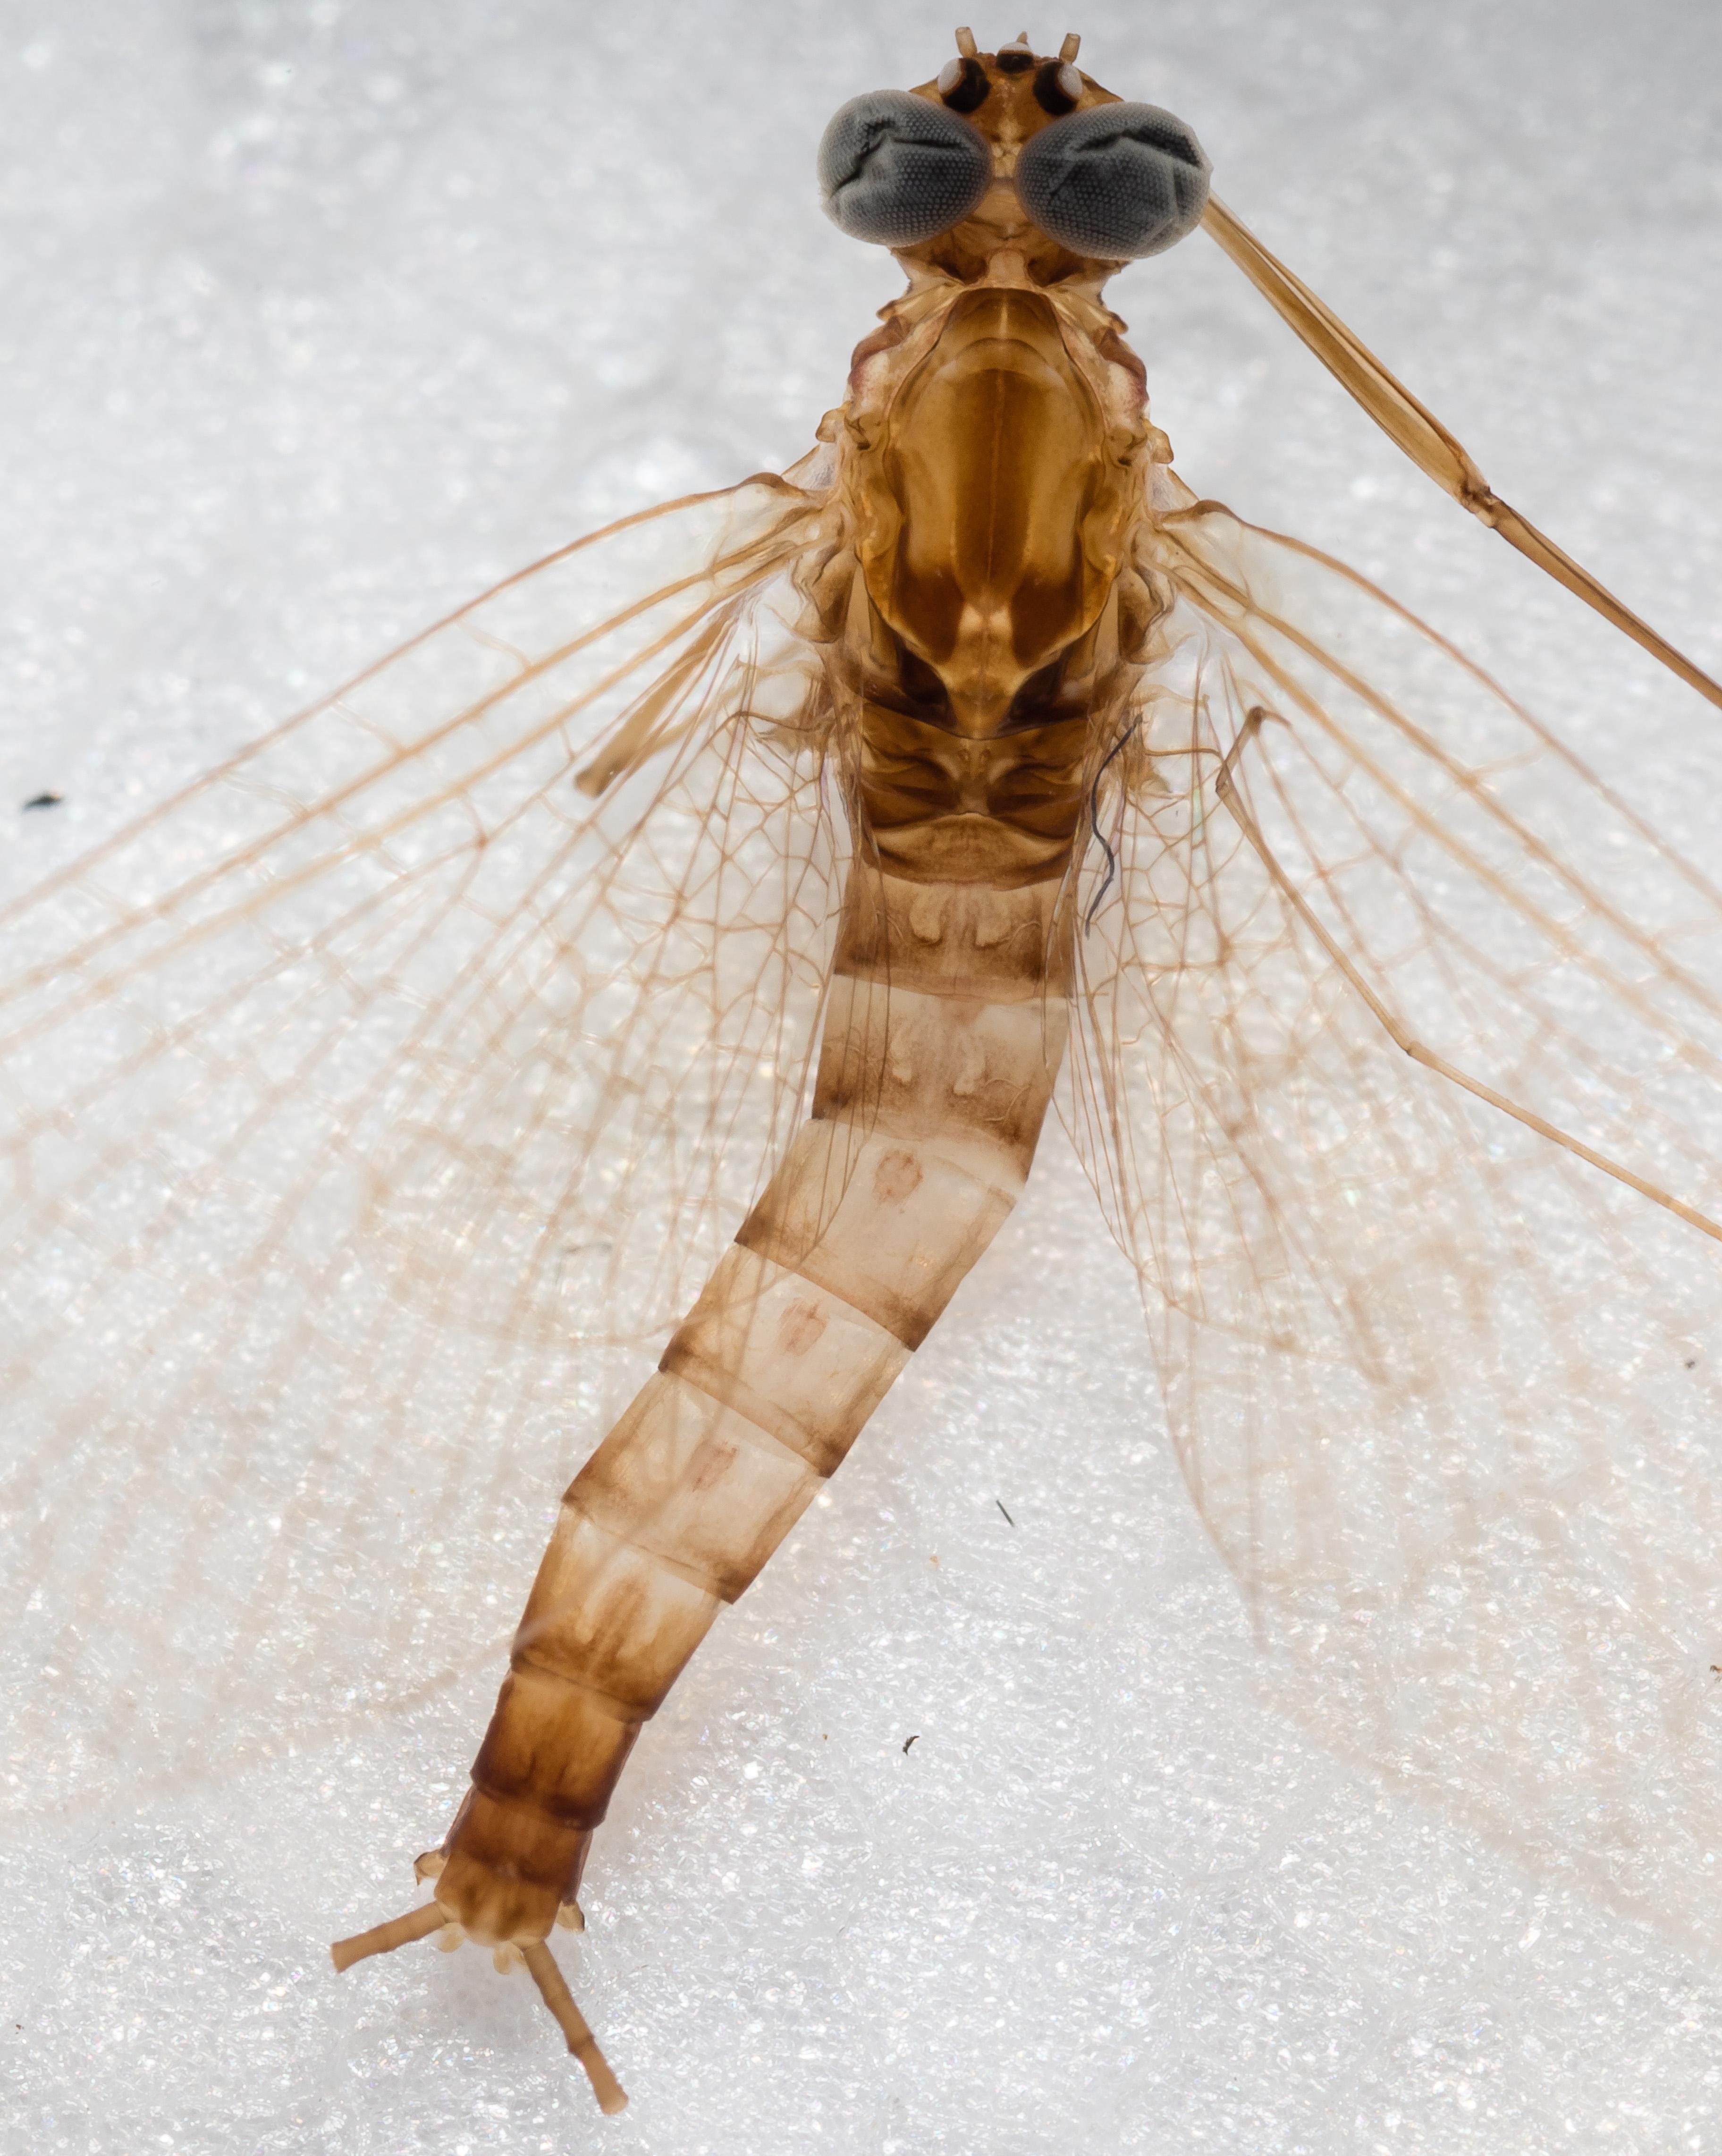 Male Cinygmula ramaleyi (Small Western Gordon Quill) Mayfly Spinner from Mystery Creek #186 in Alaska